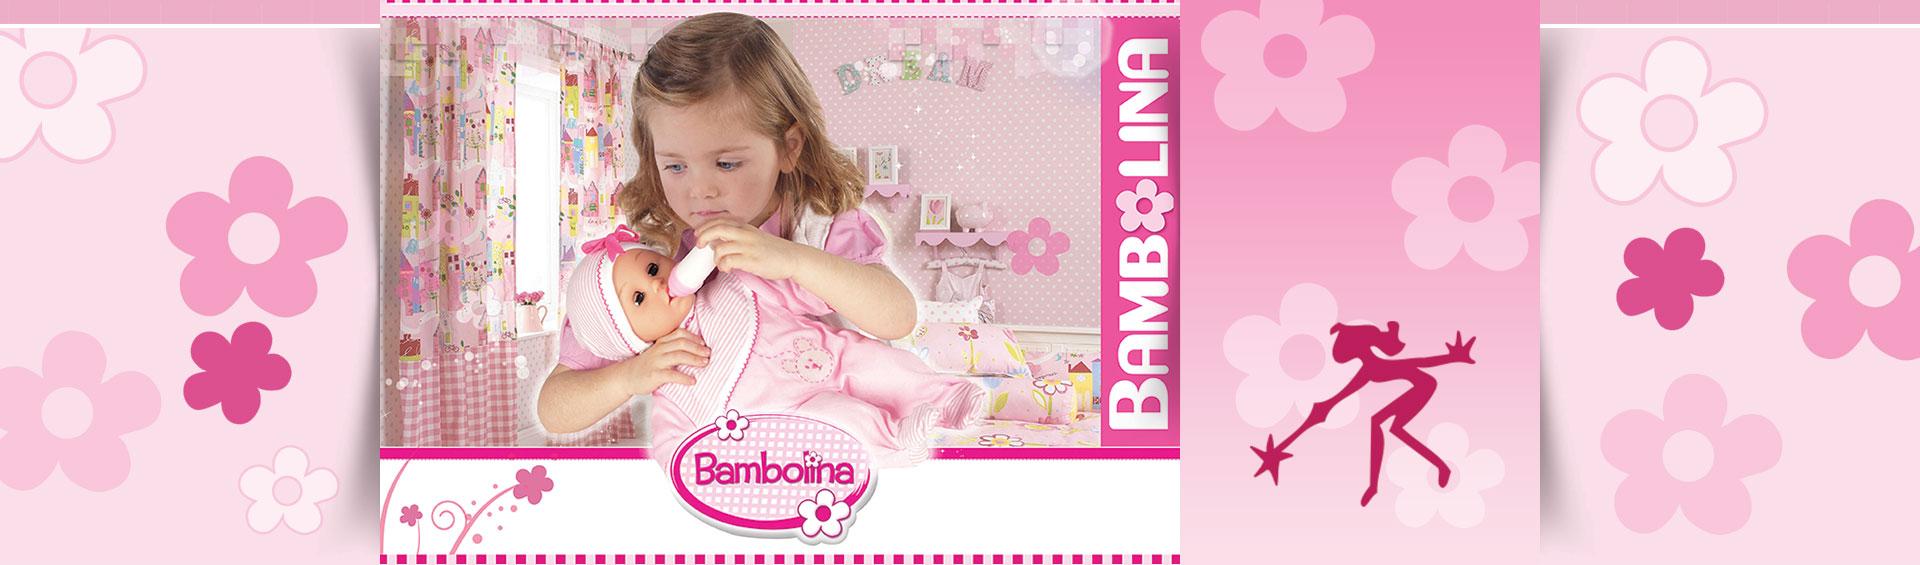 slideshow2016-bambolina